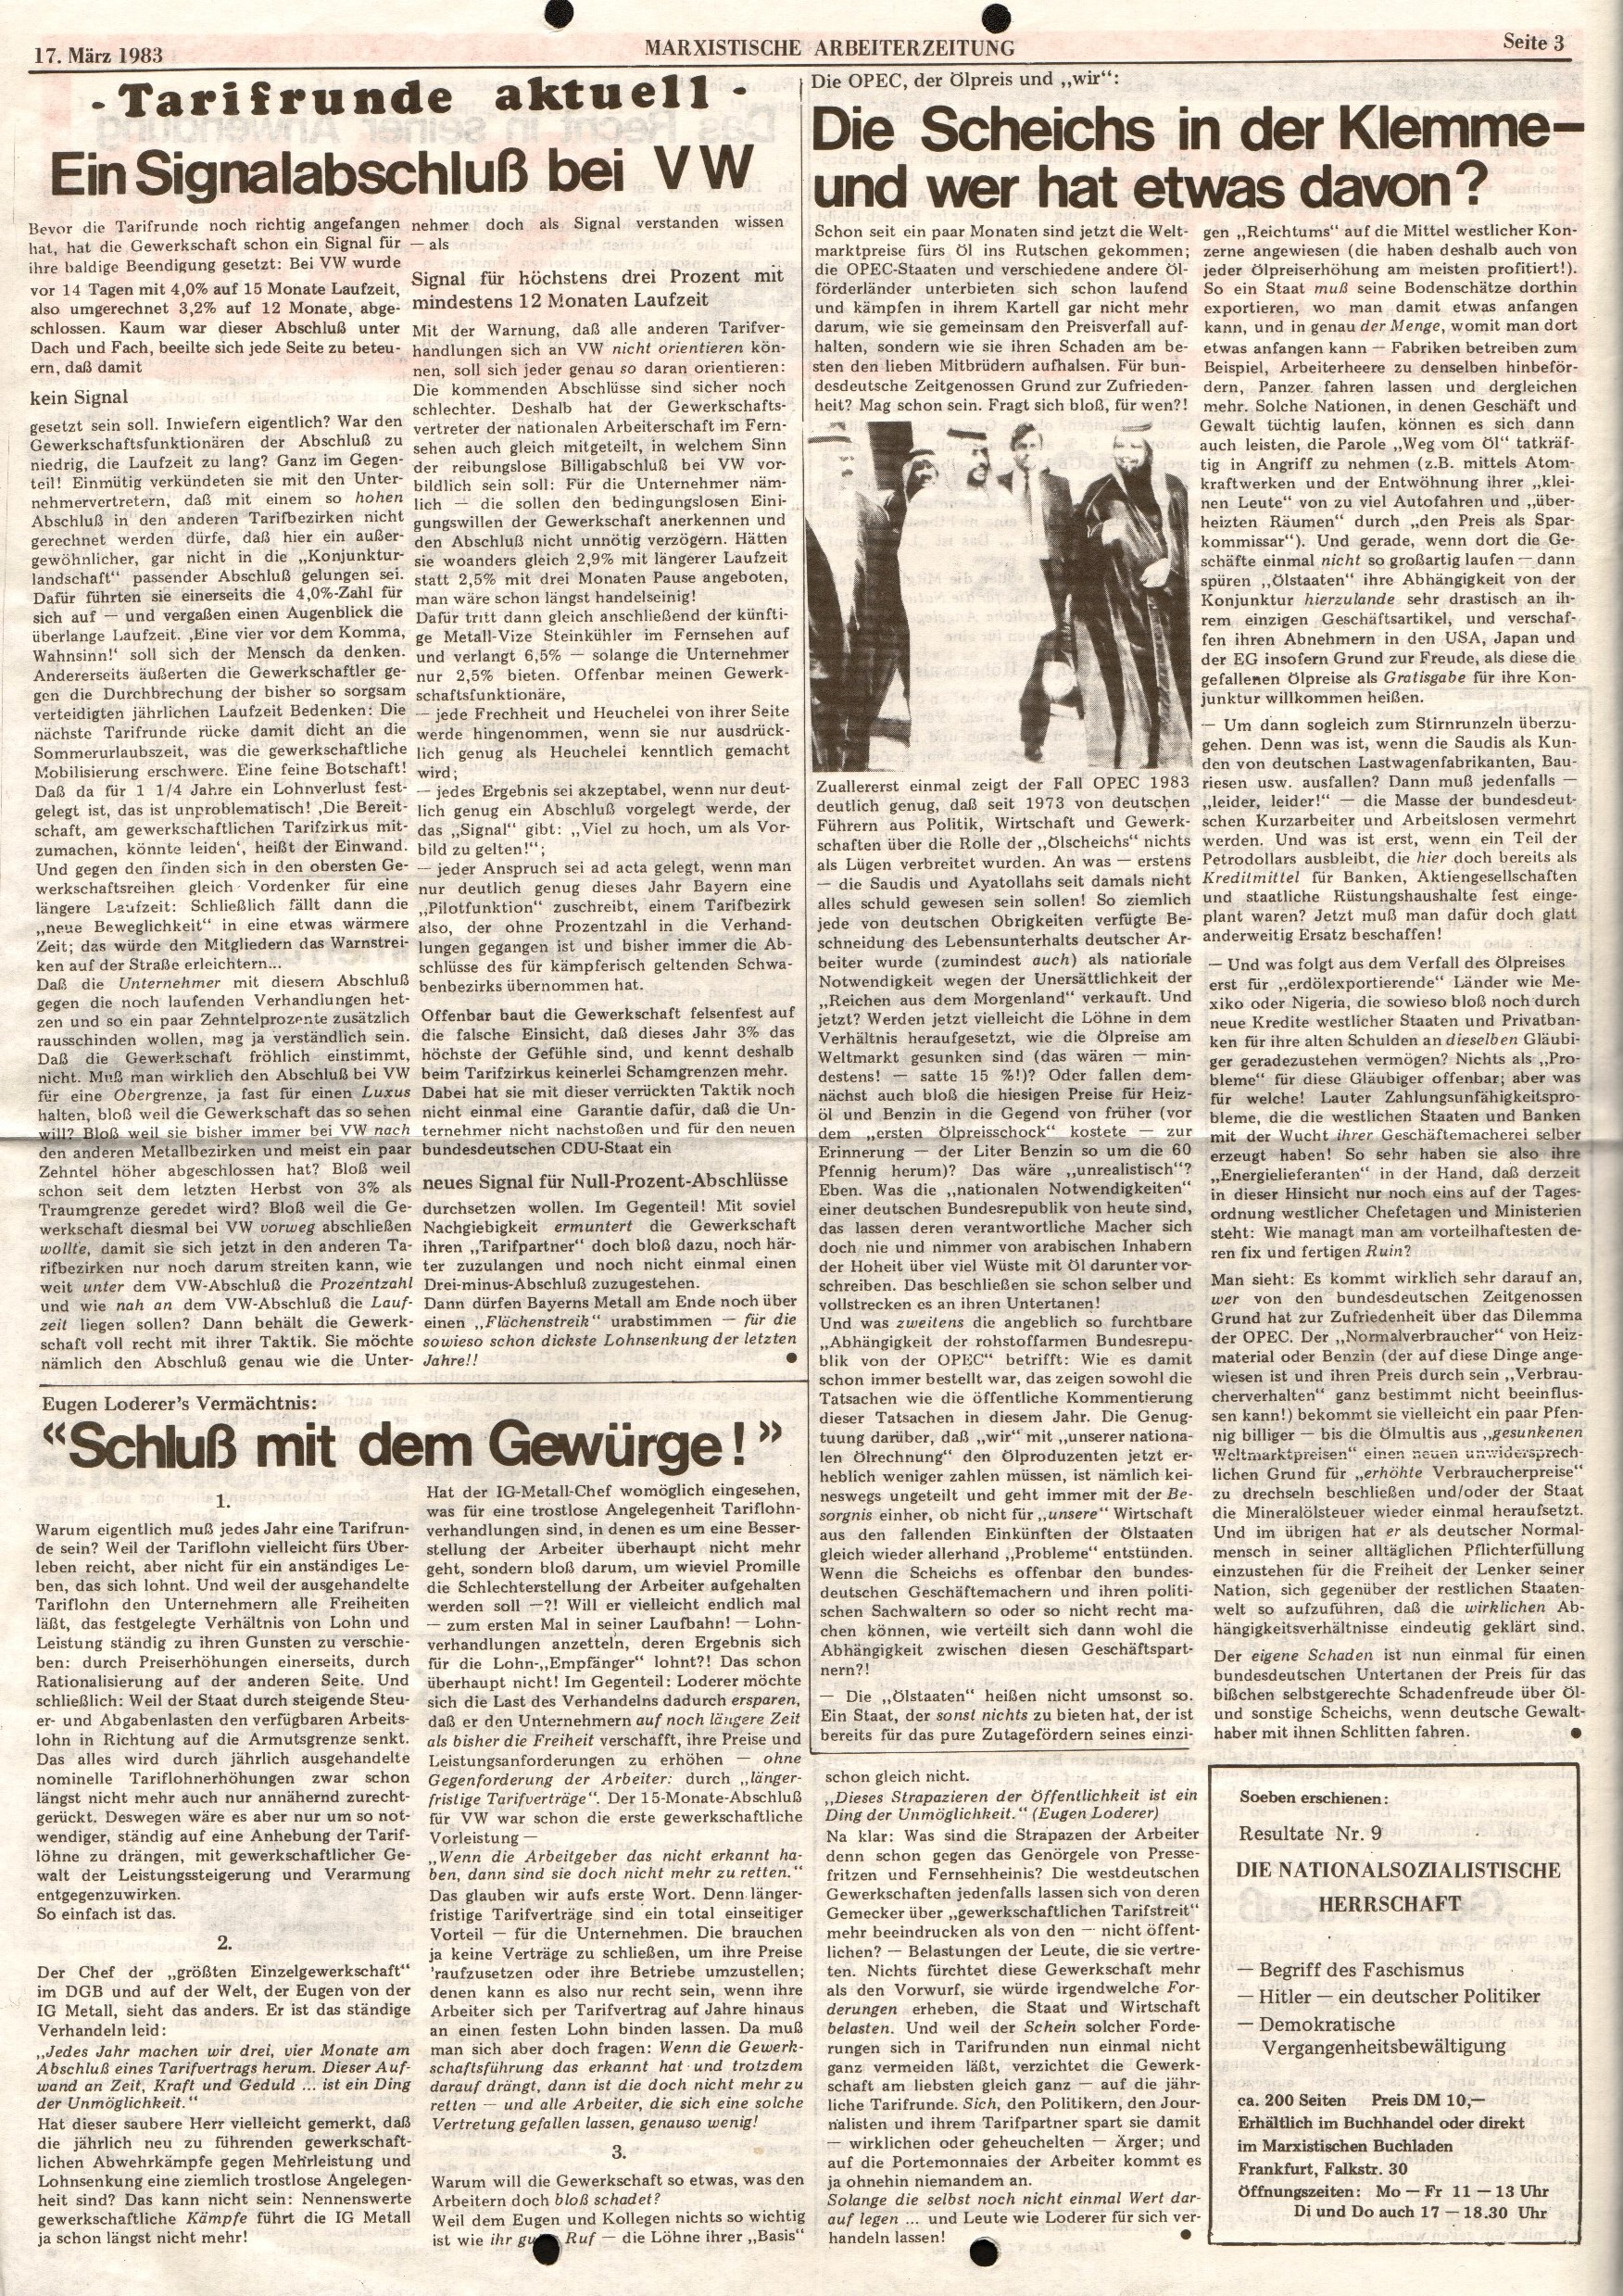 Frankfurt_CPK_Hoechst_MAZ141